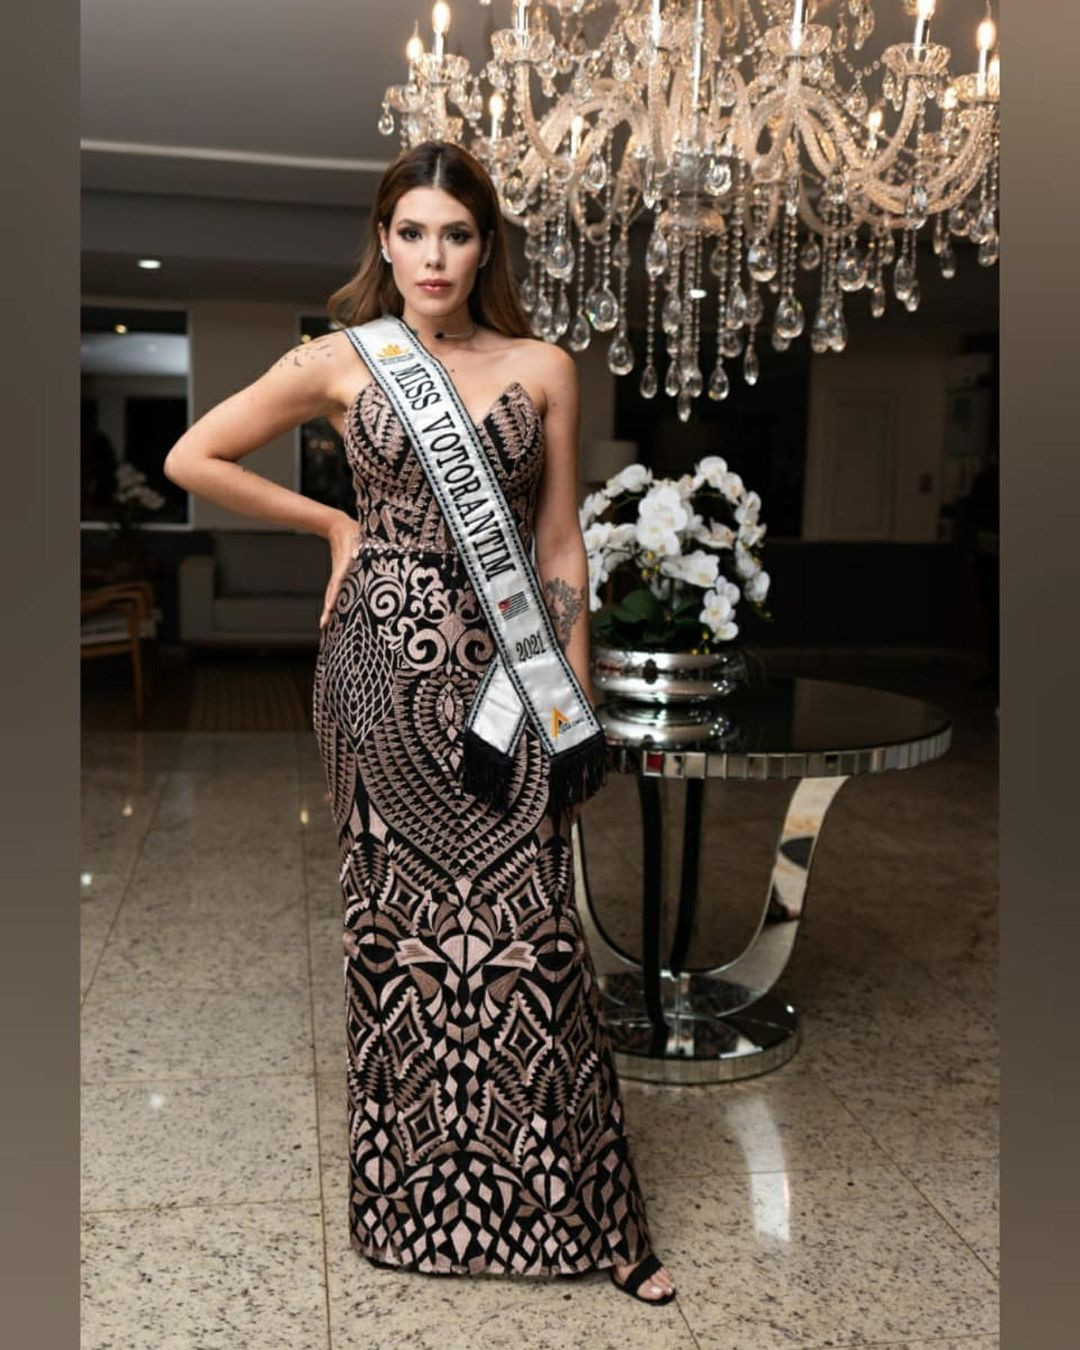 candidatas a miss sao paulo mundo 2022. - Página 2 BZy3zv